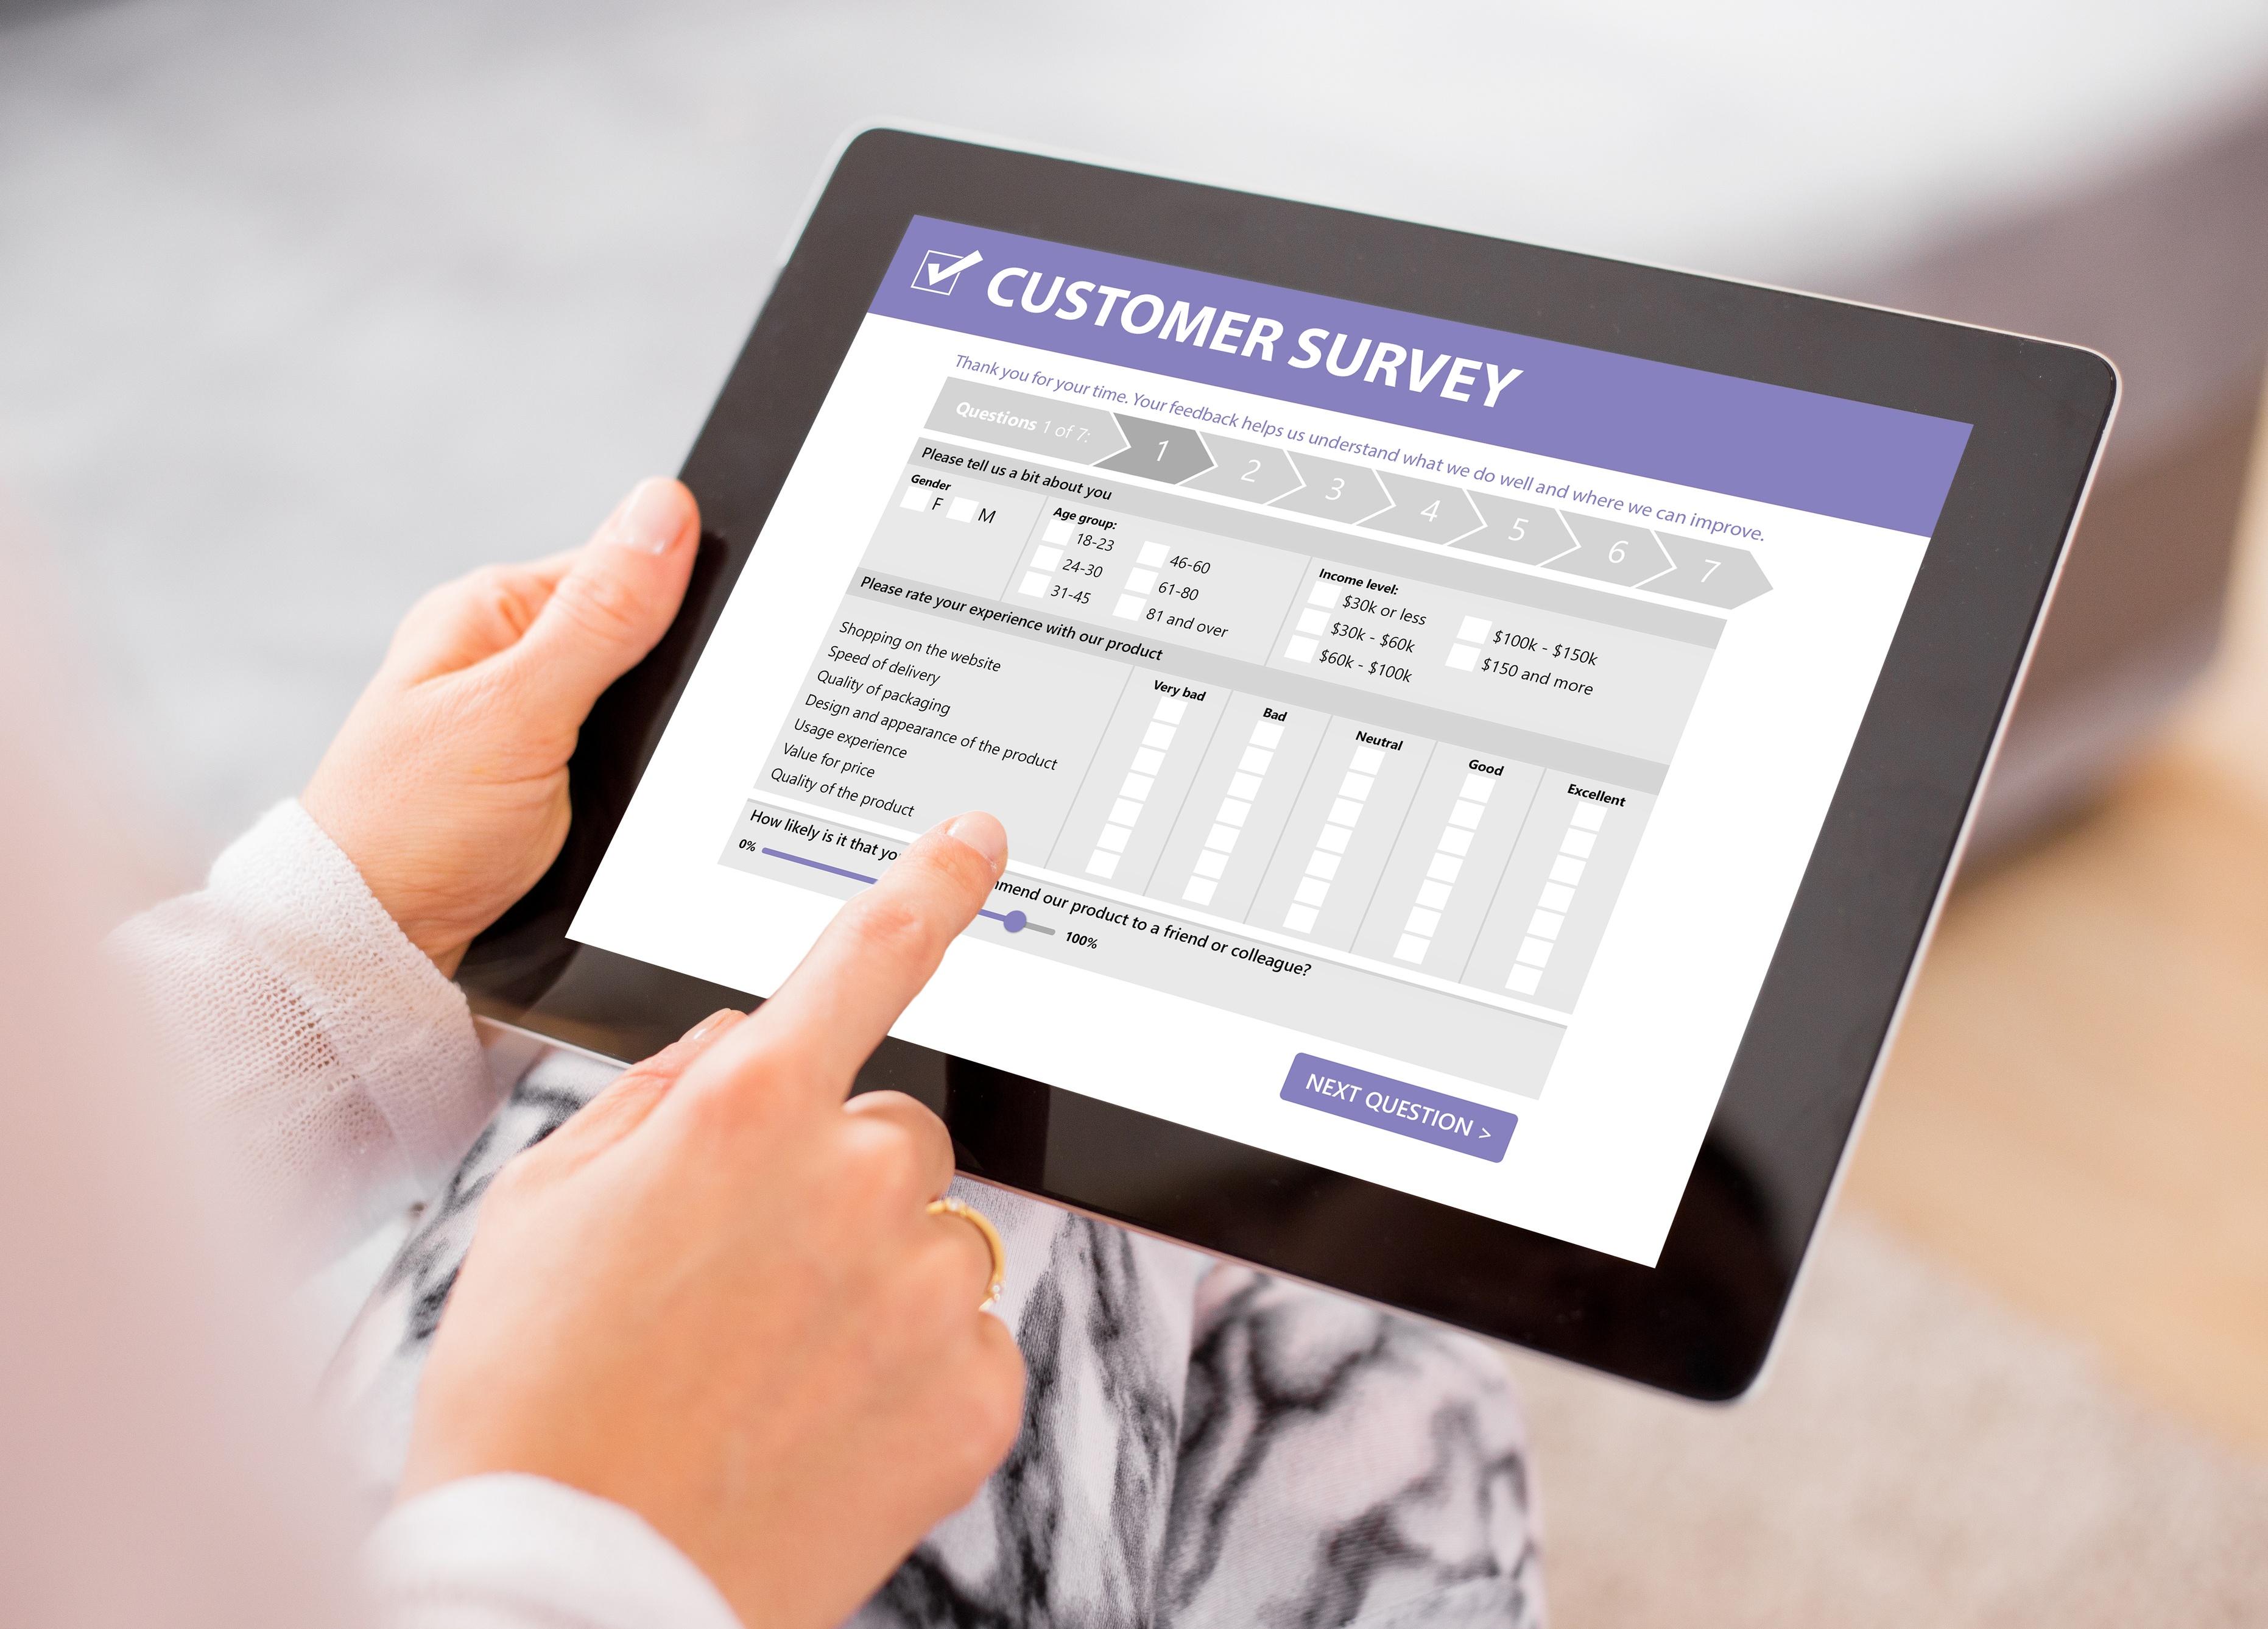 Customer-survey-844020332_3727x2676